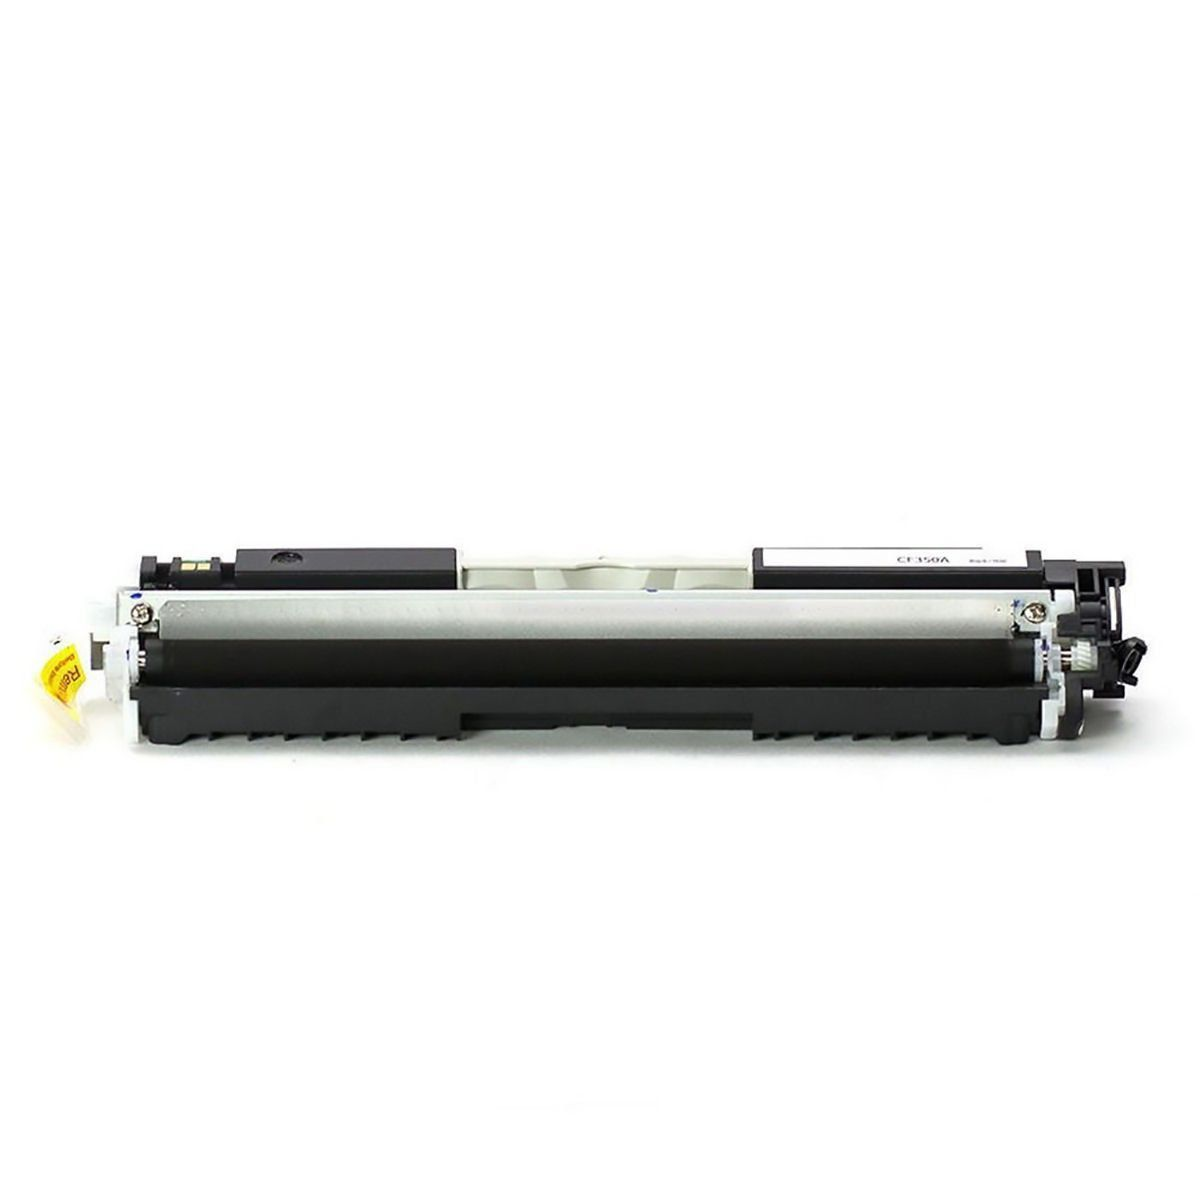 Toner Compatível HP CF350A 350A 130A Universal Black 1.200 Páginas - Cartucho & Cia